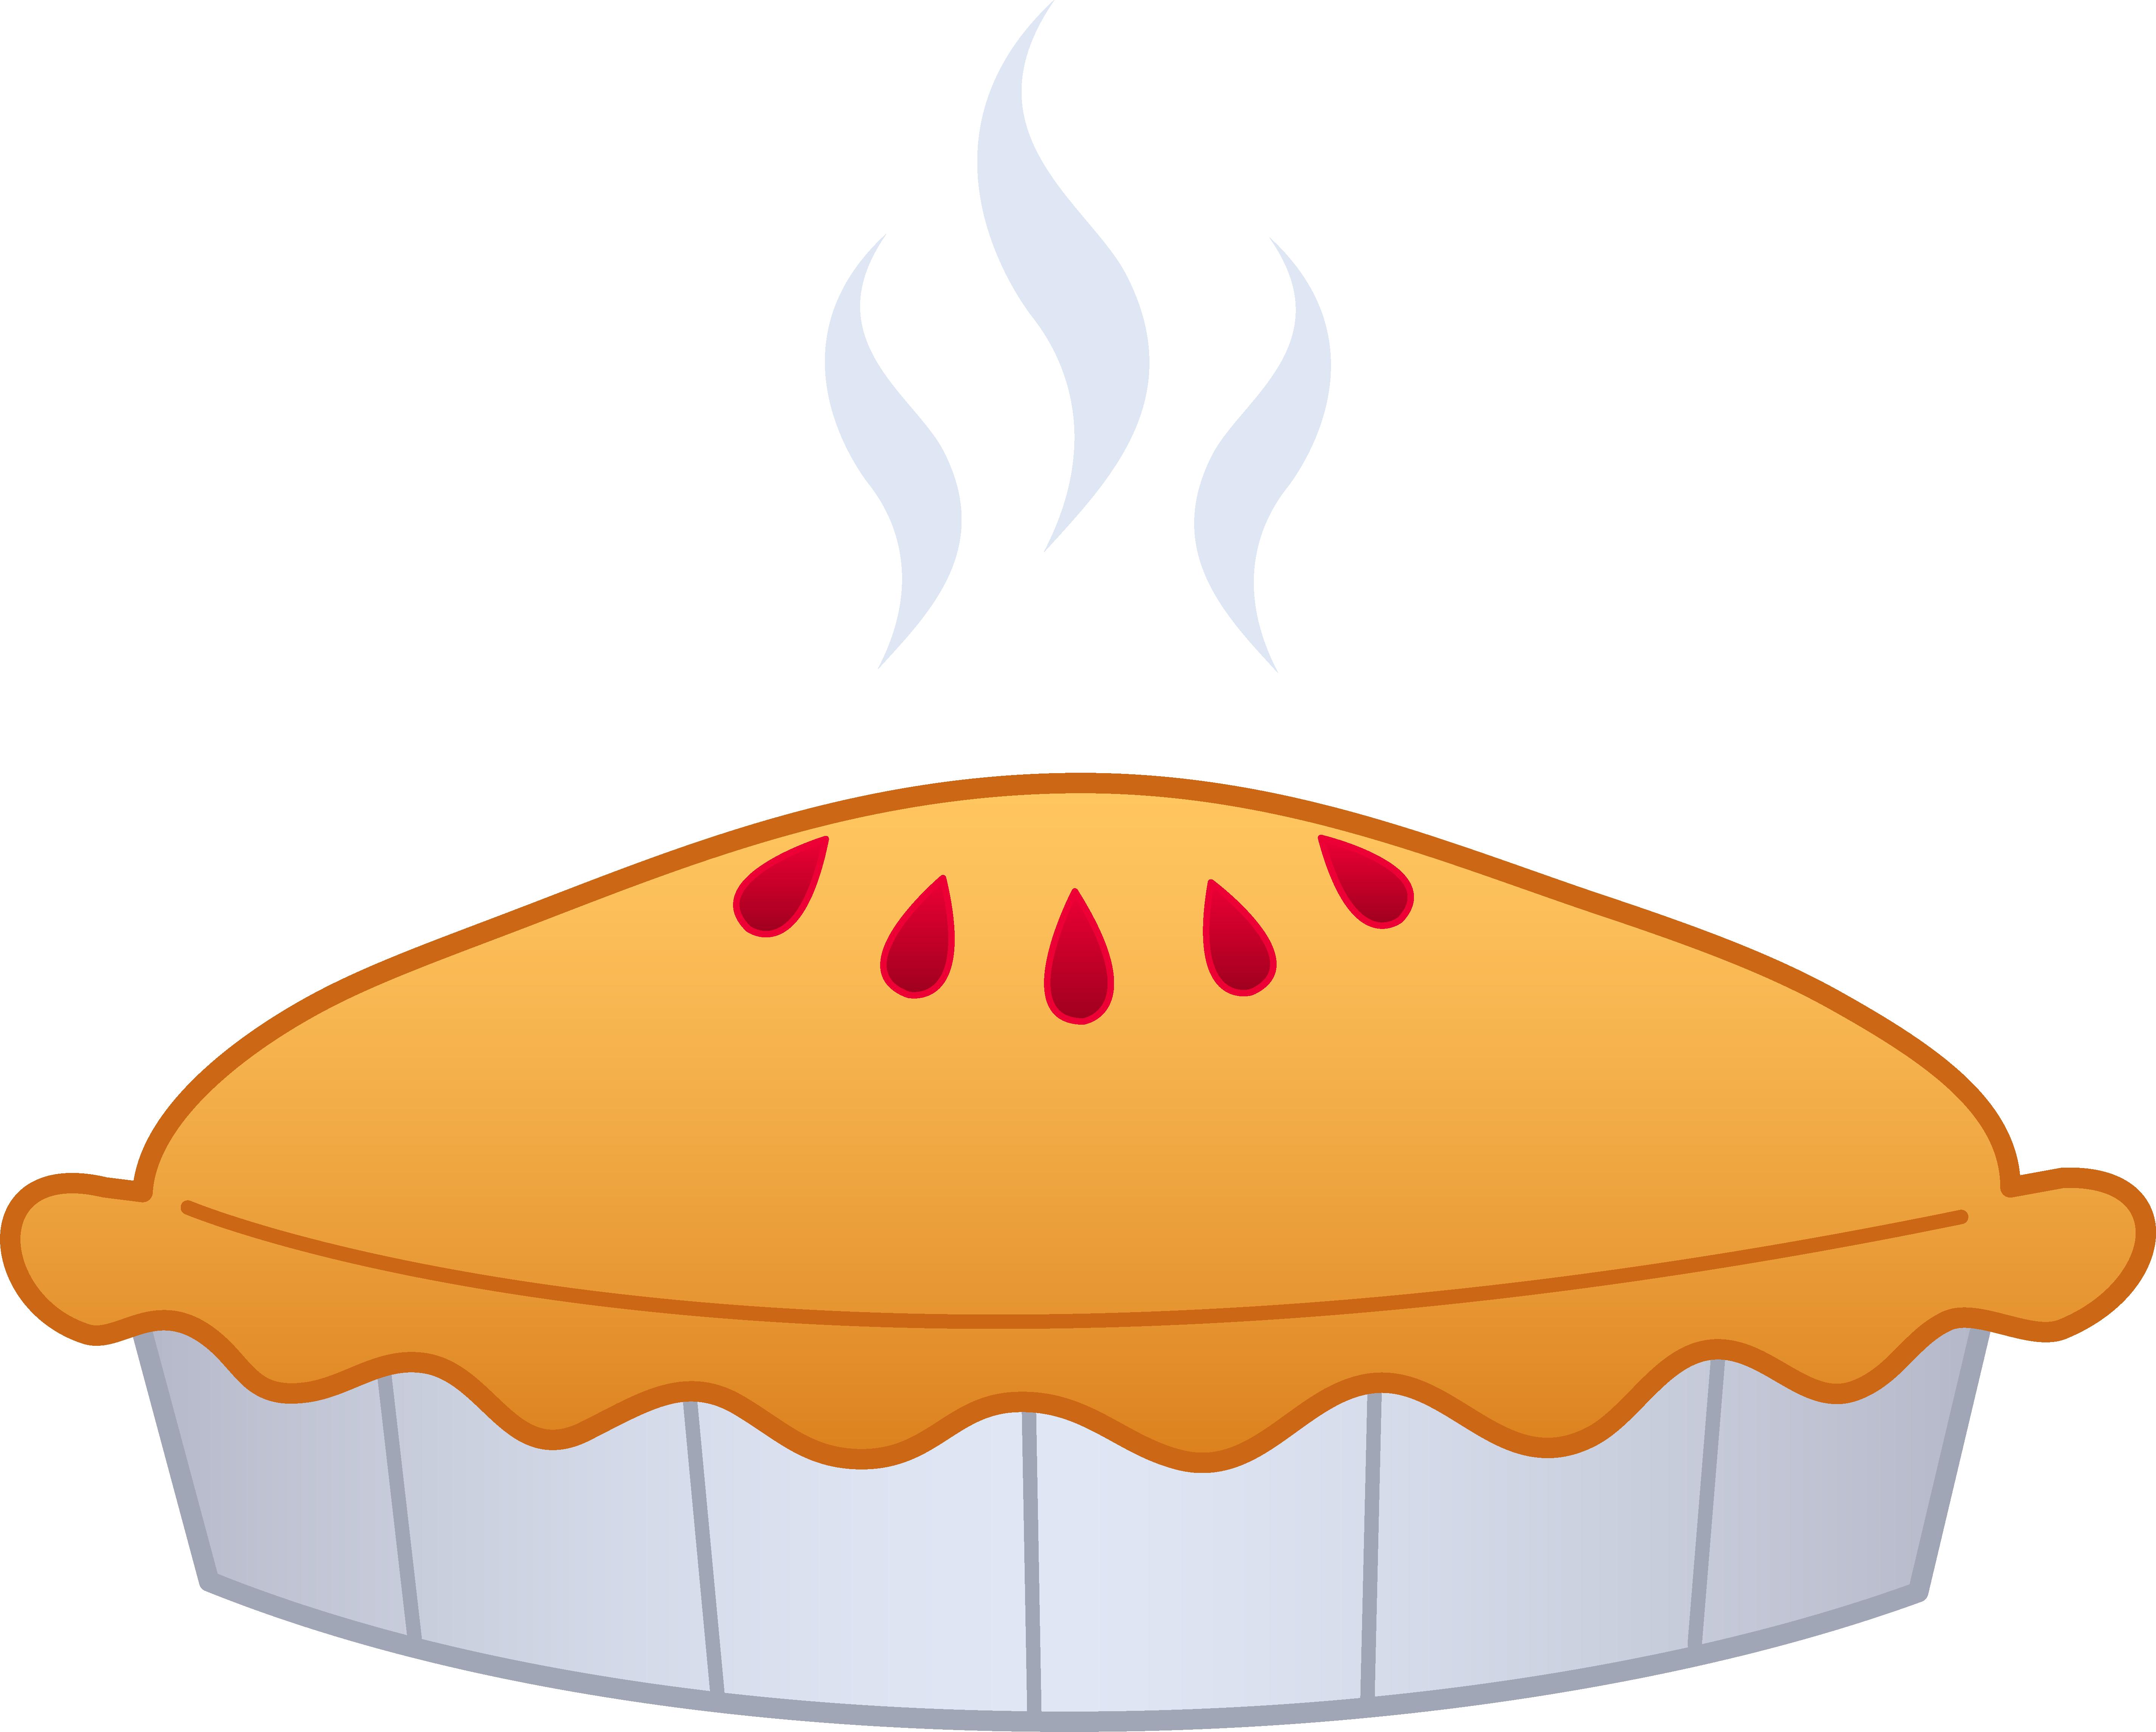 Apple Pie Clipart Png.